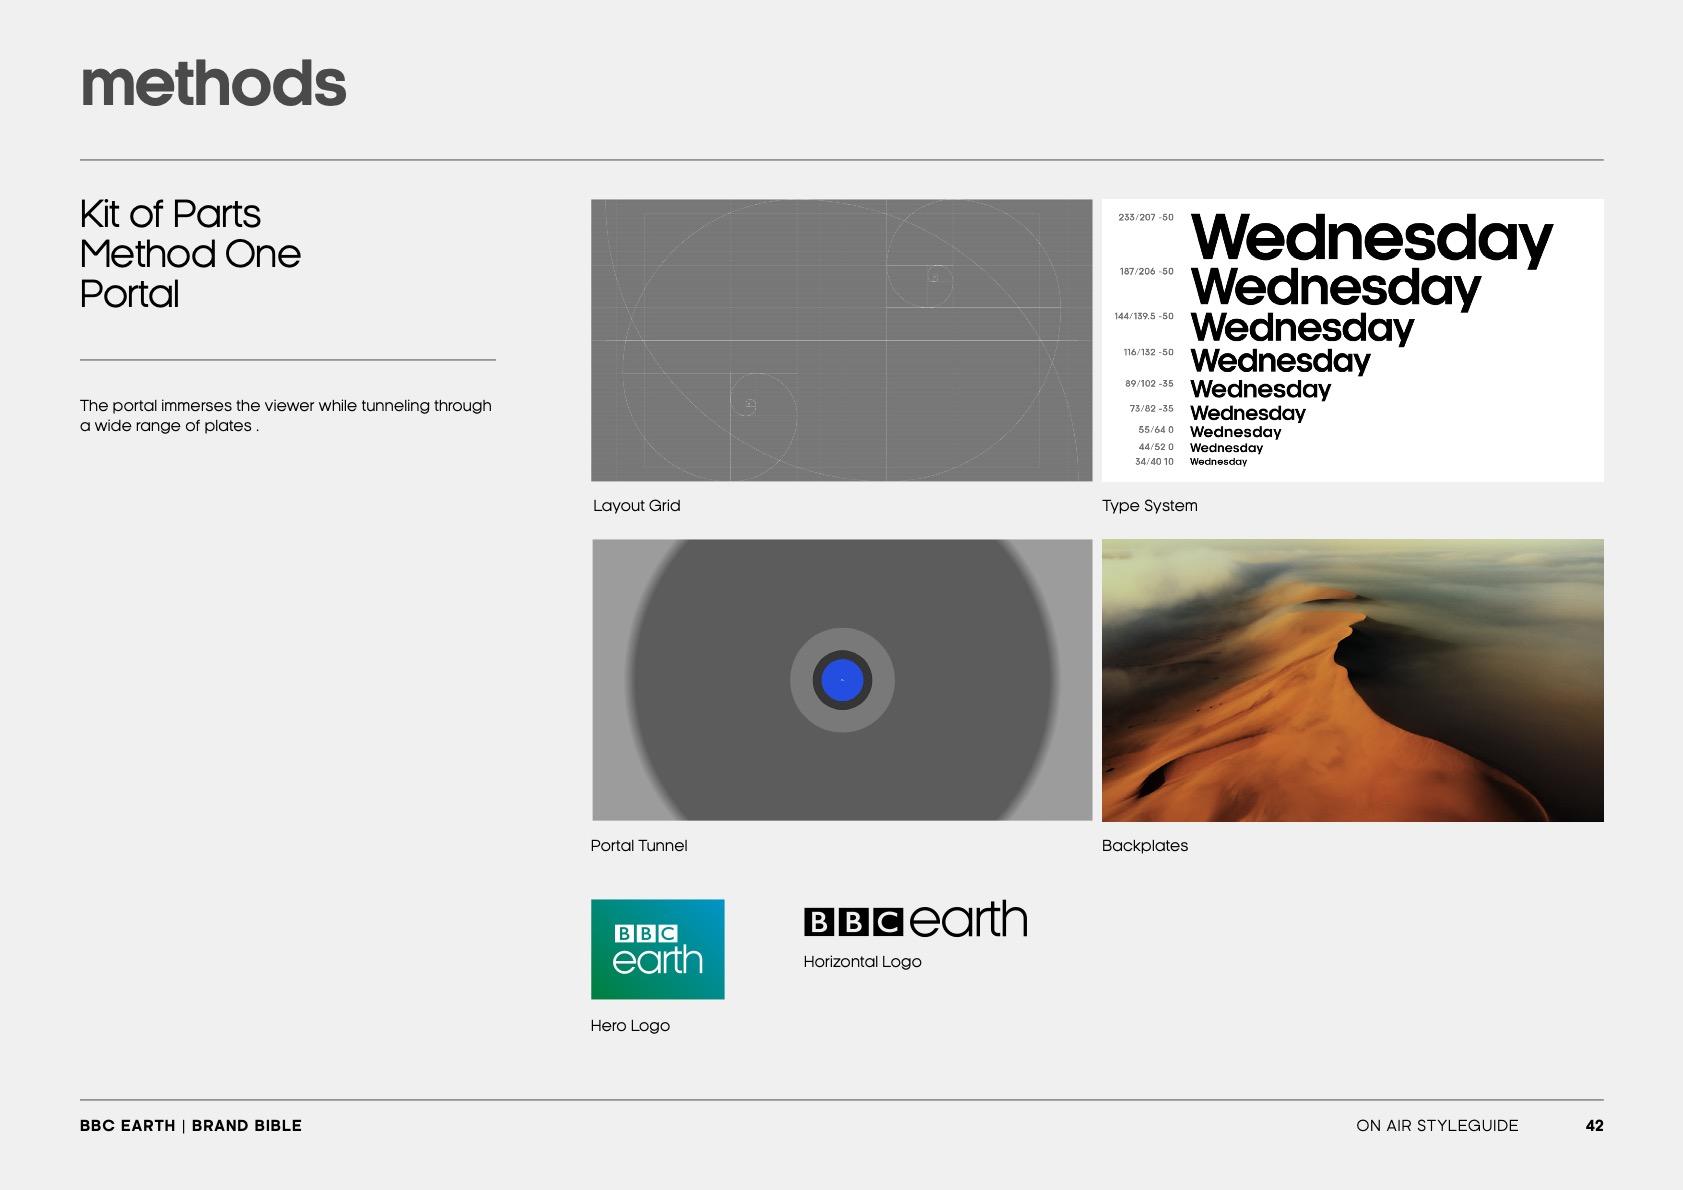 160208_BBC_Earth_Styleguide_Book_00_pa 42.jpeg